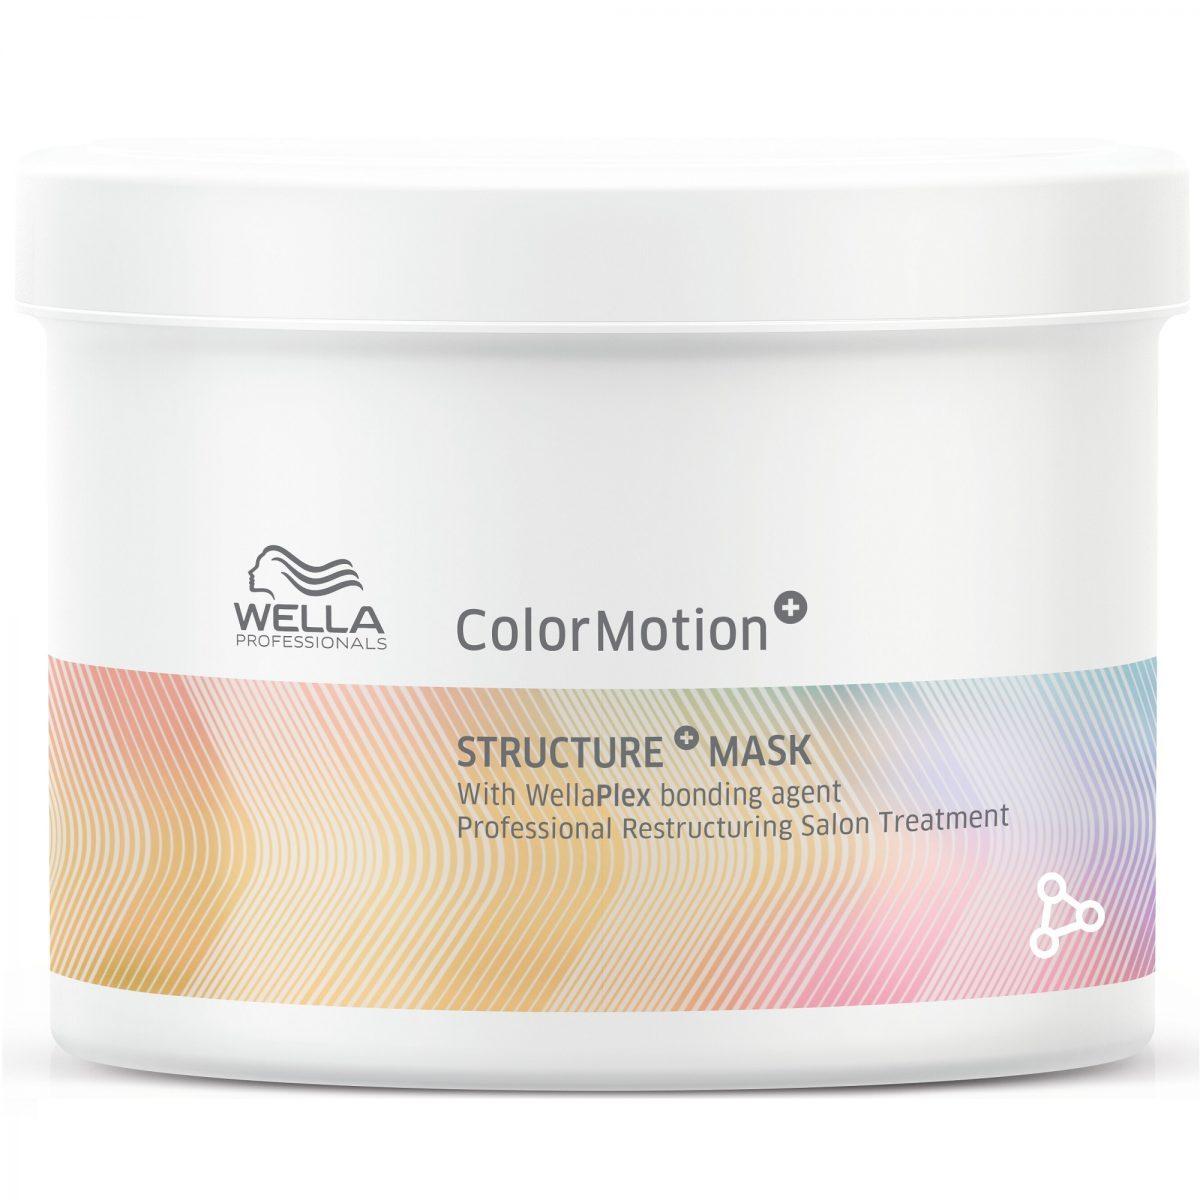 07_Emphase_Wella_Color_Motion_Mascarilla_500ml